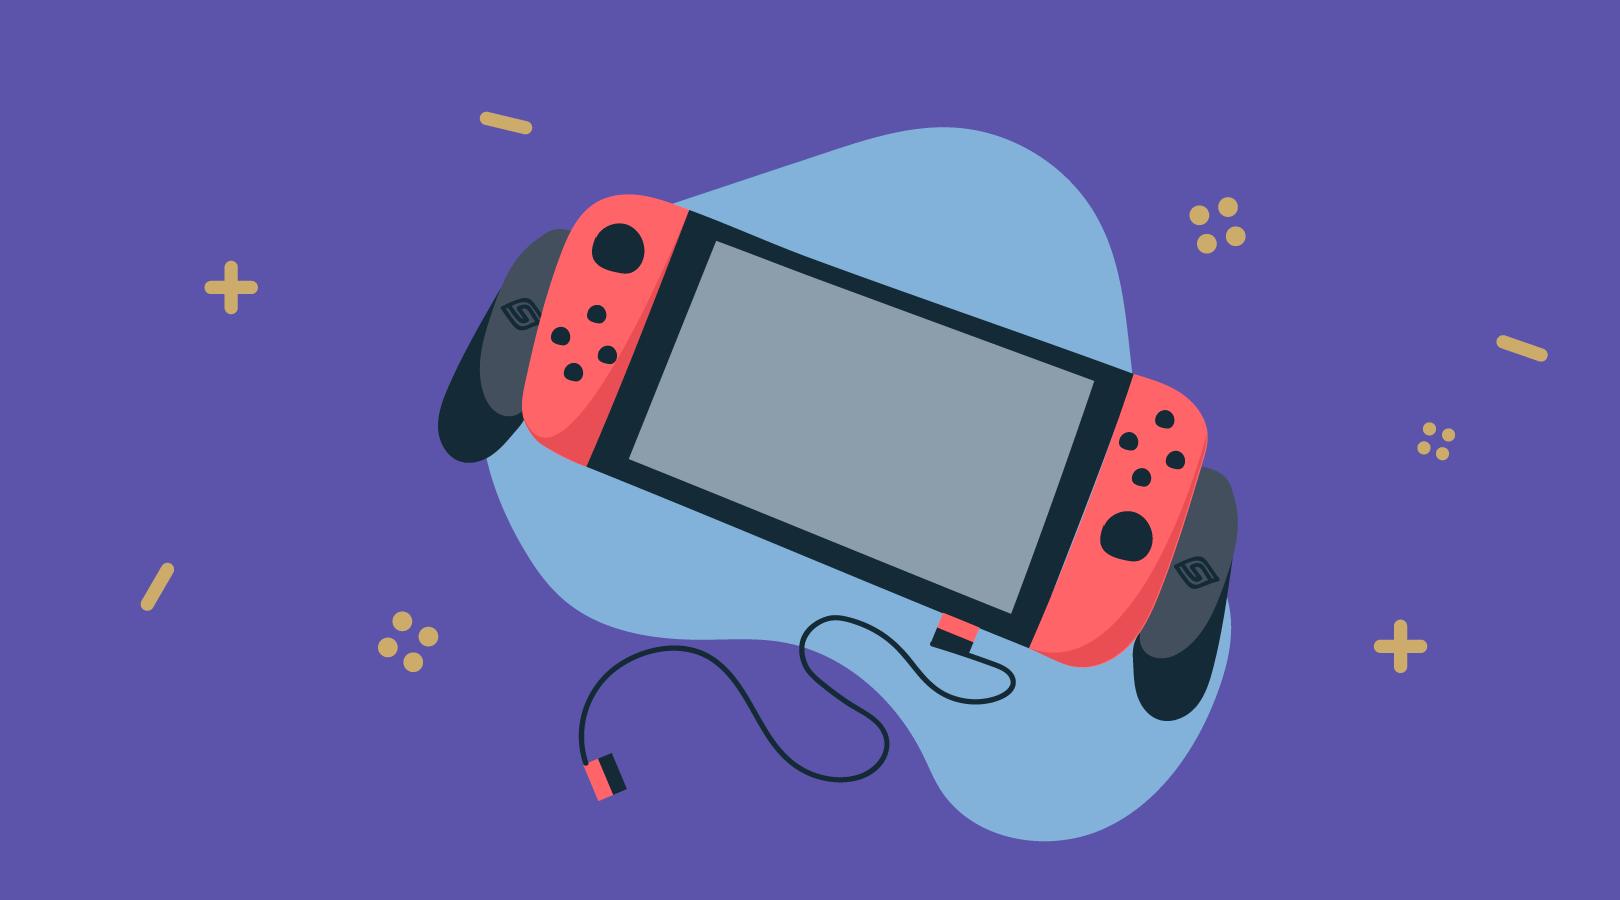 Satisfye: Helping Nintendo Switch Gamers Get a Grip